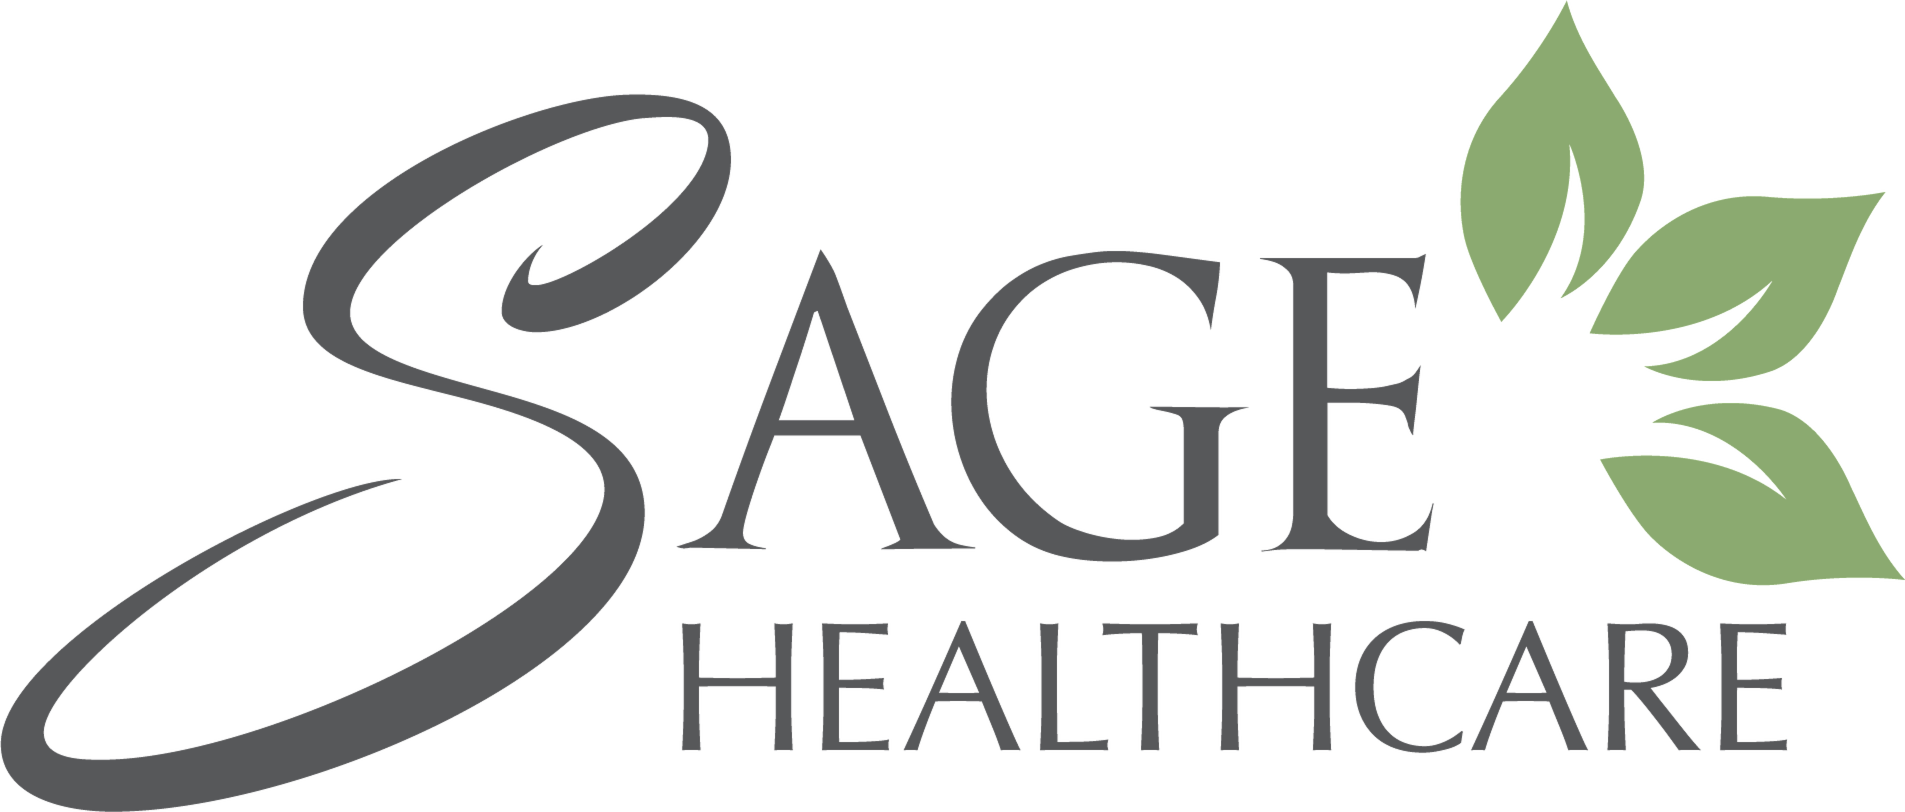 SAGE Healthcare